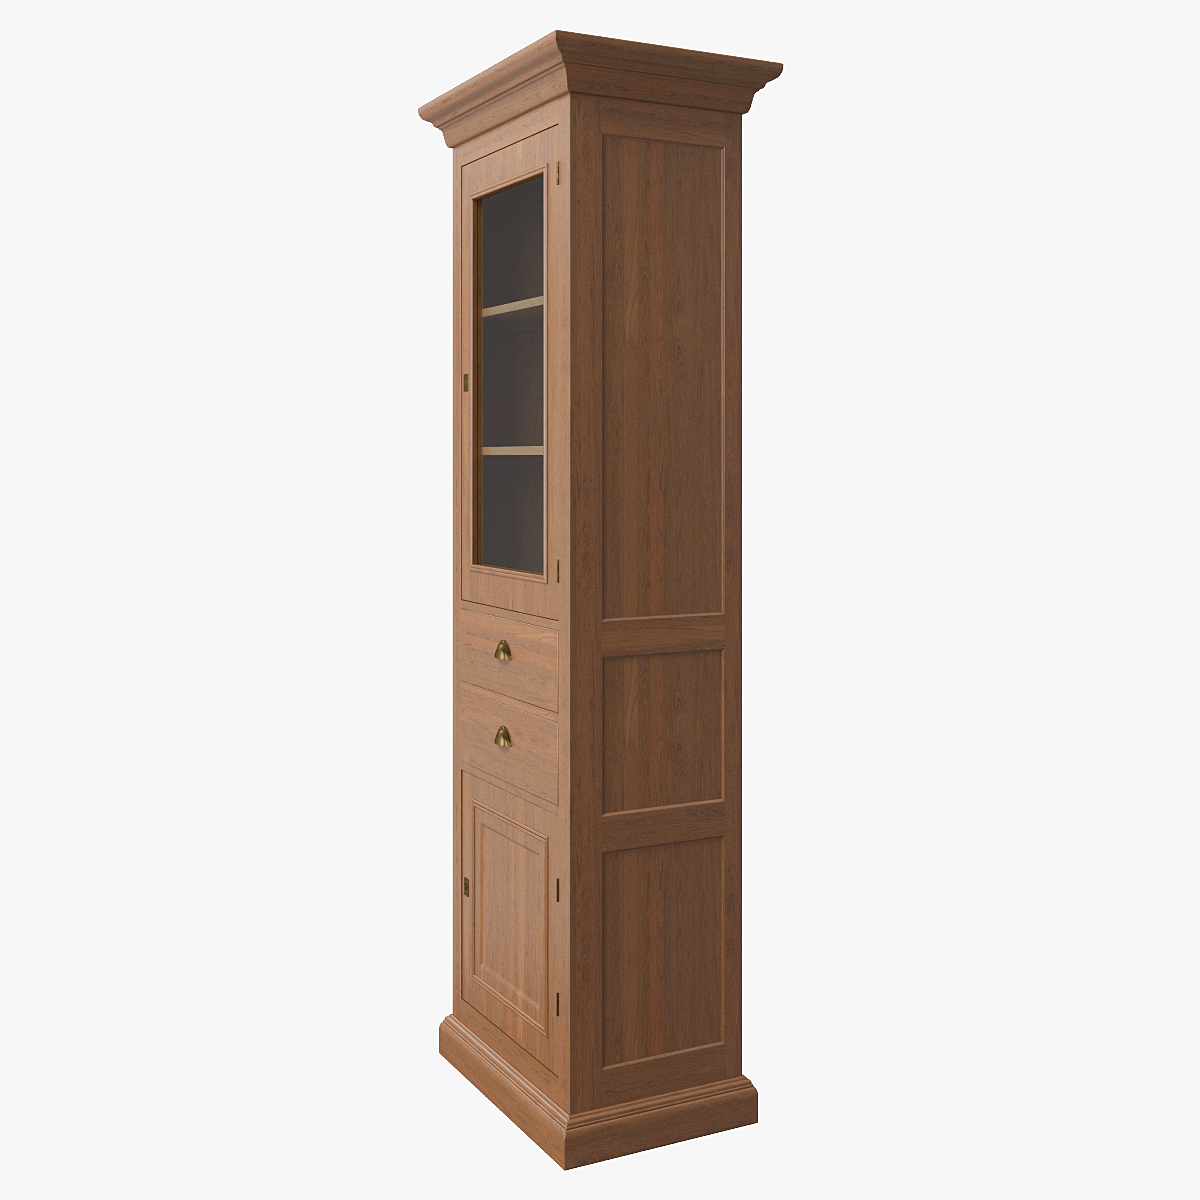 Multipurpose Cabinet   3DOcean Item For Sale · Shot_02.PNG Shot_03.